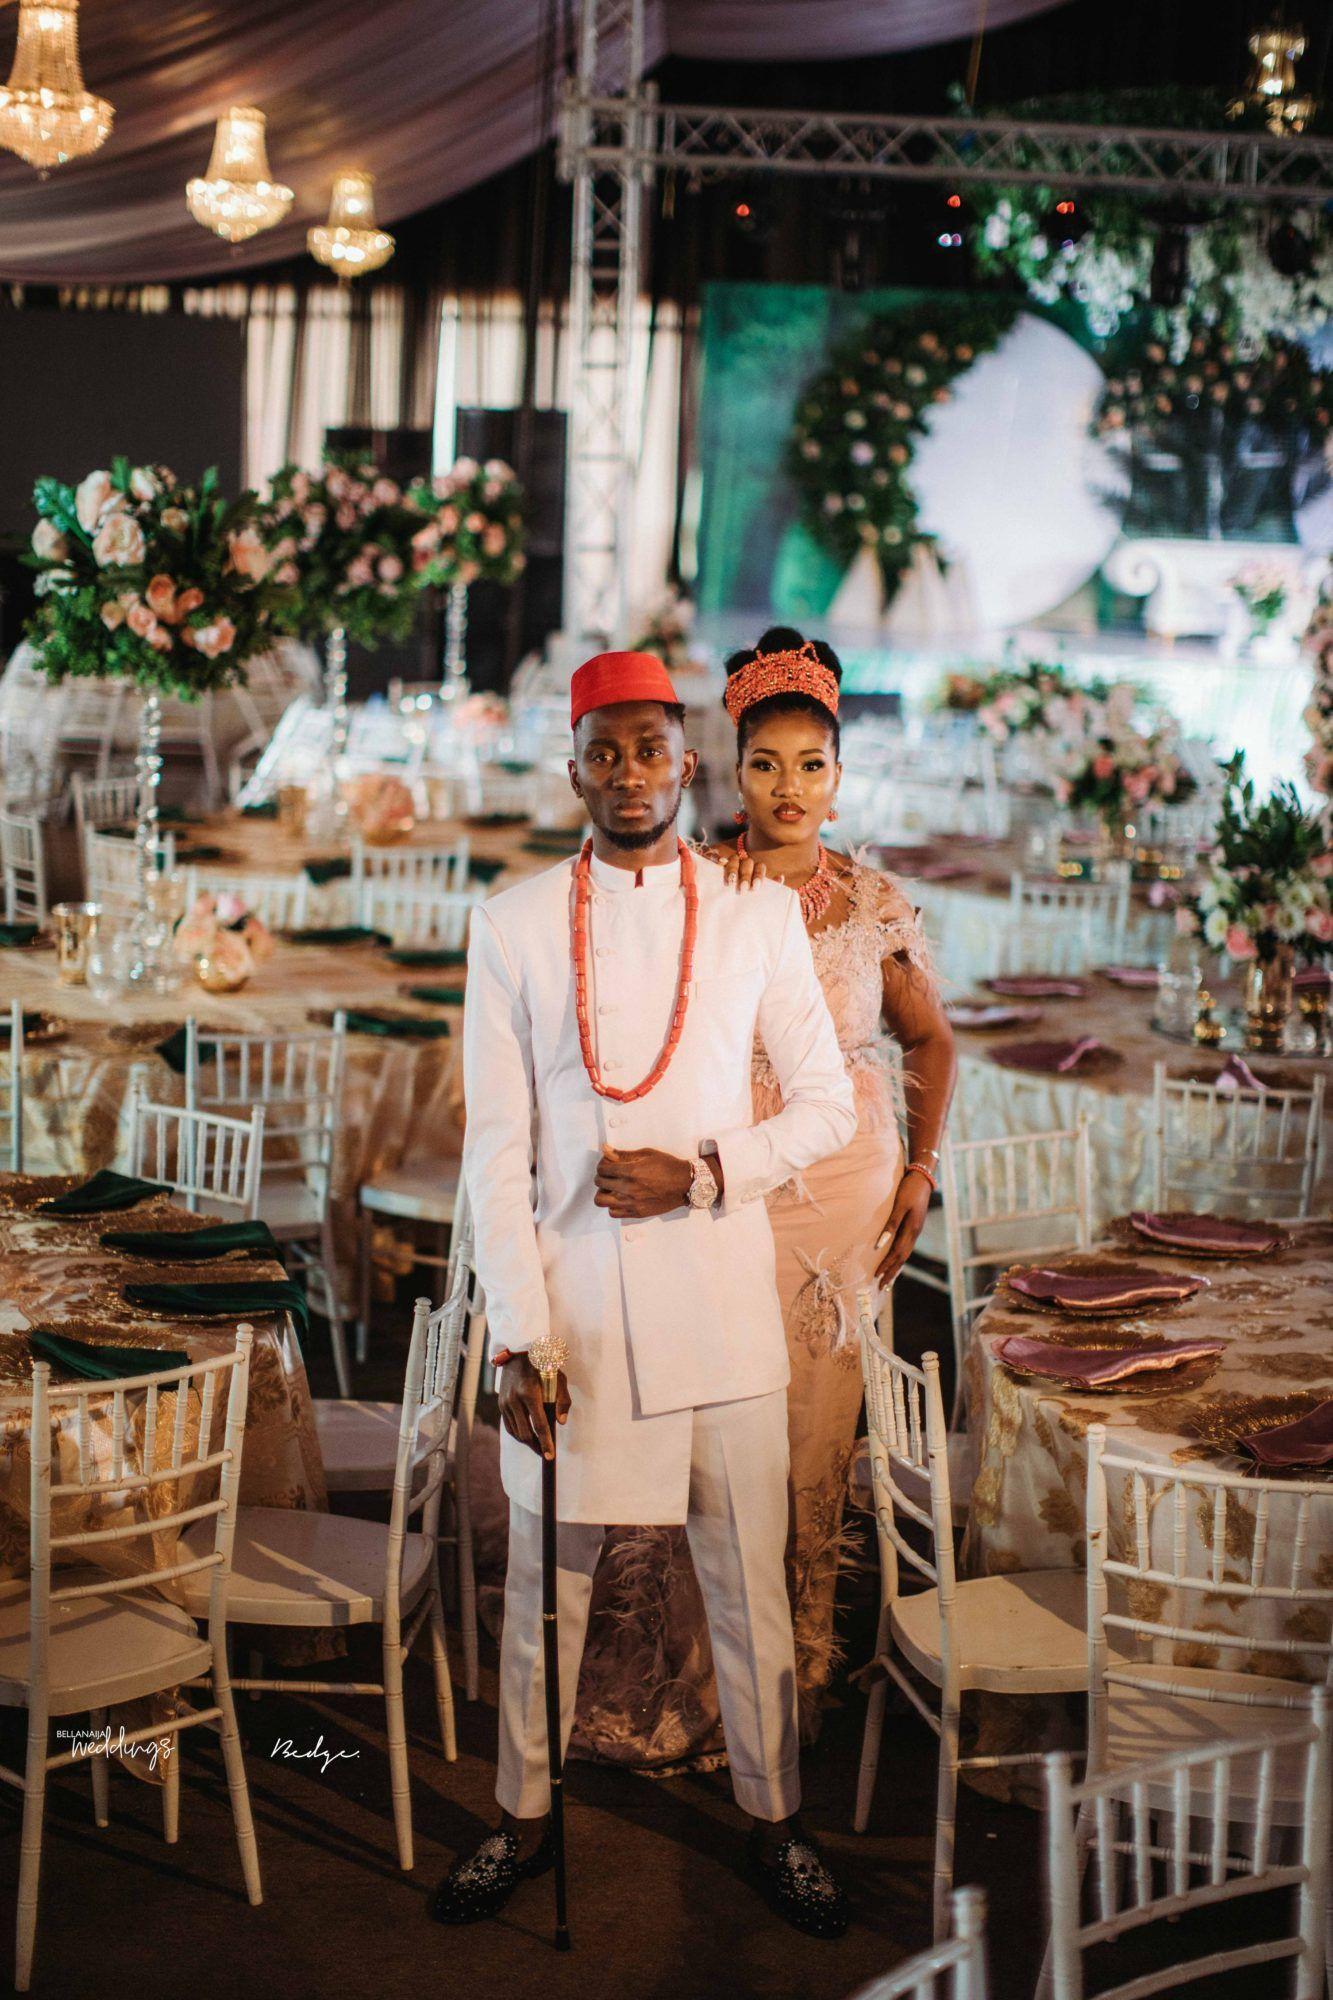 Nigerian Dresses For Nigerian Brides, Wilfred Ndidi, Monique Lhuillier